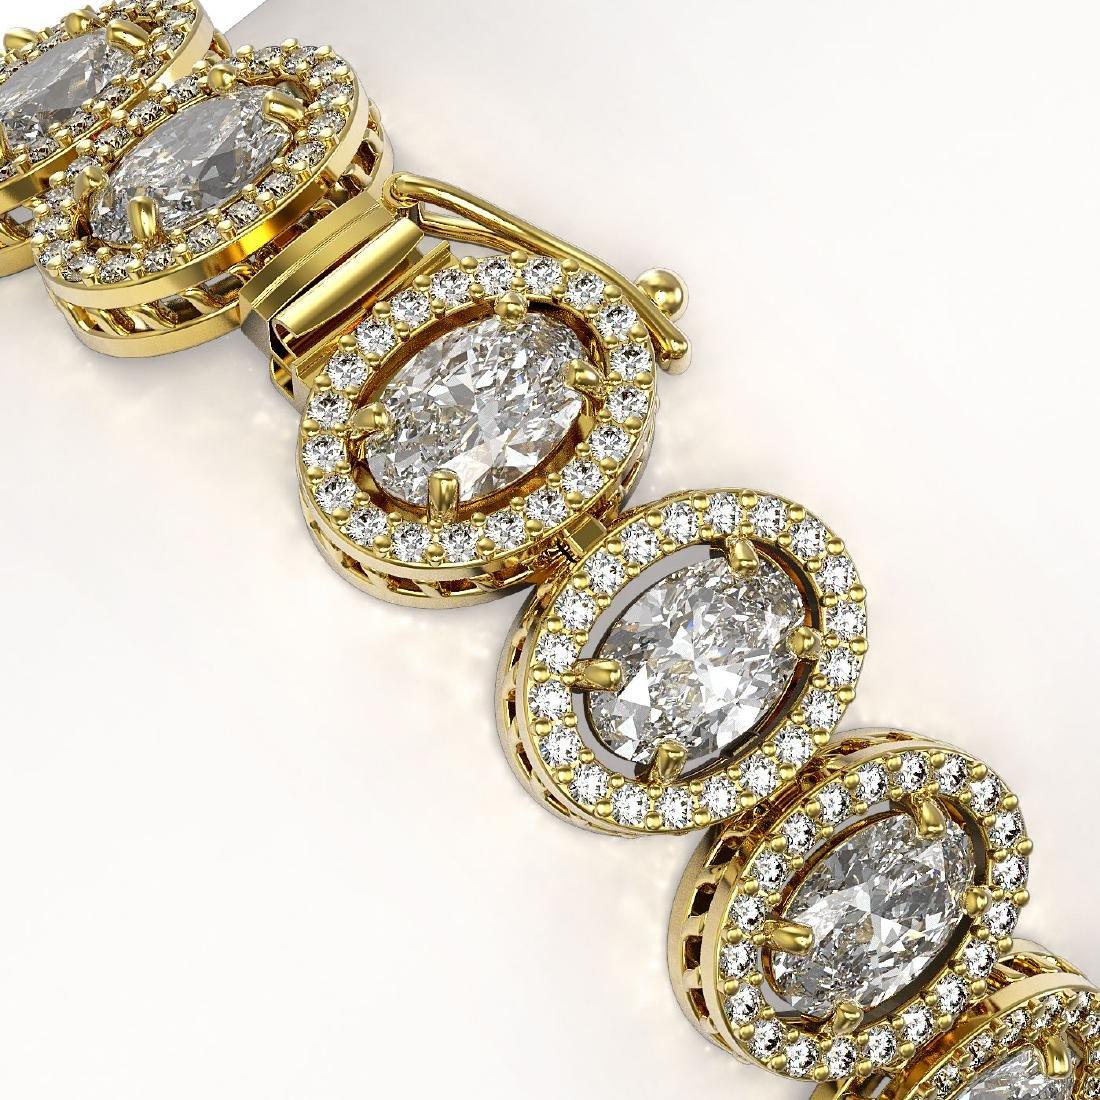 18.8 CTW Oval Diamond Designer Bracelet 18K Yellow Gold - 3